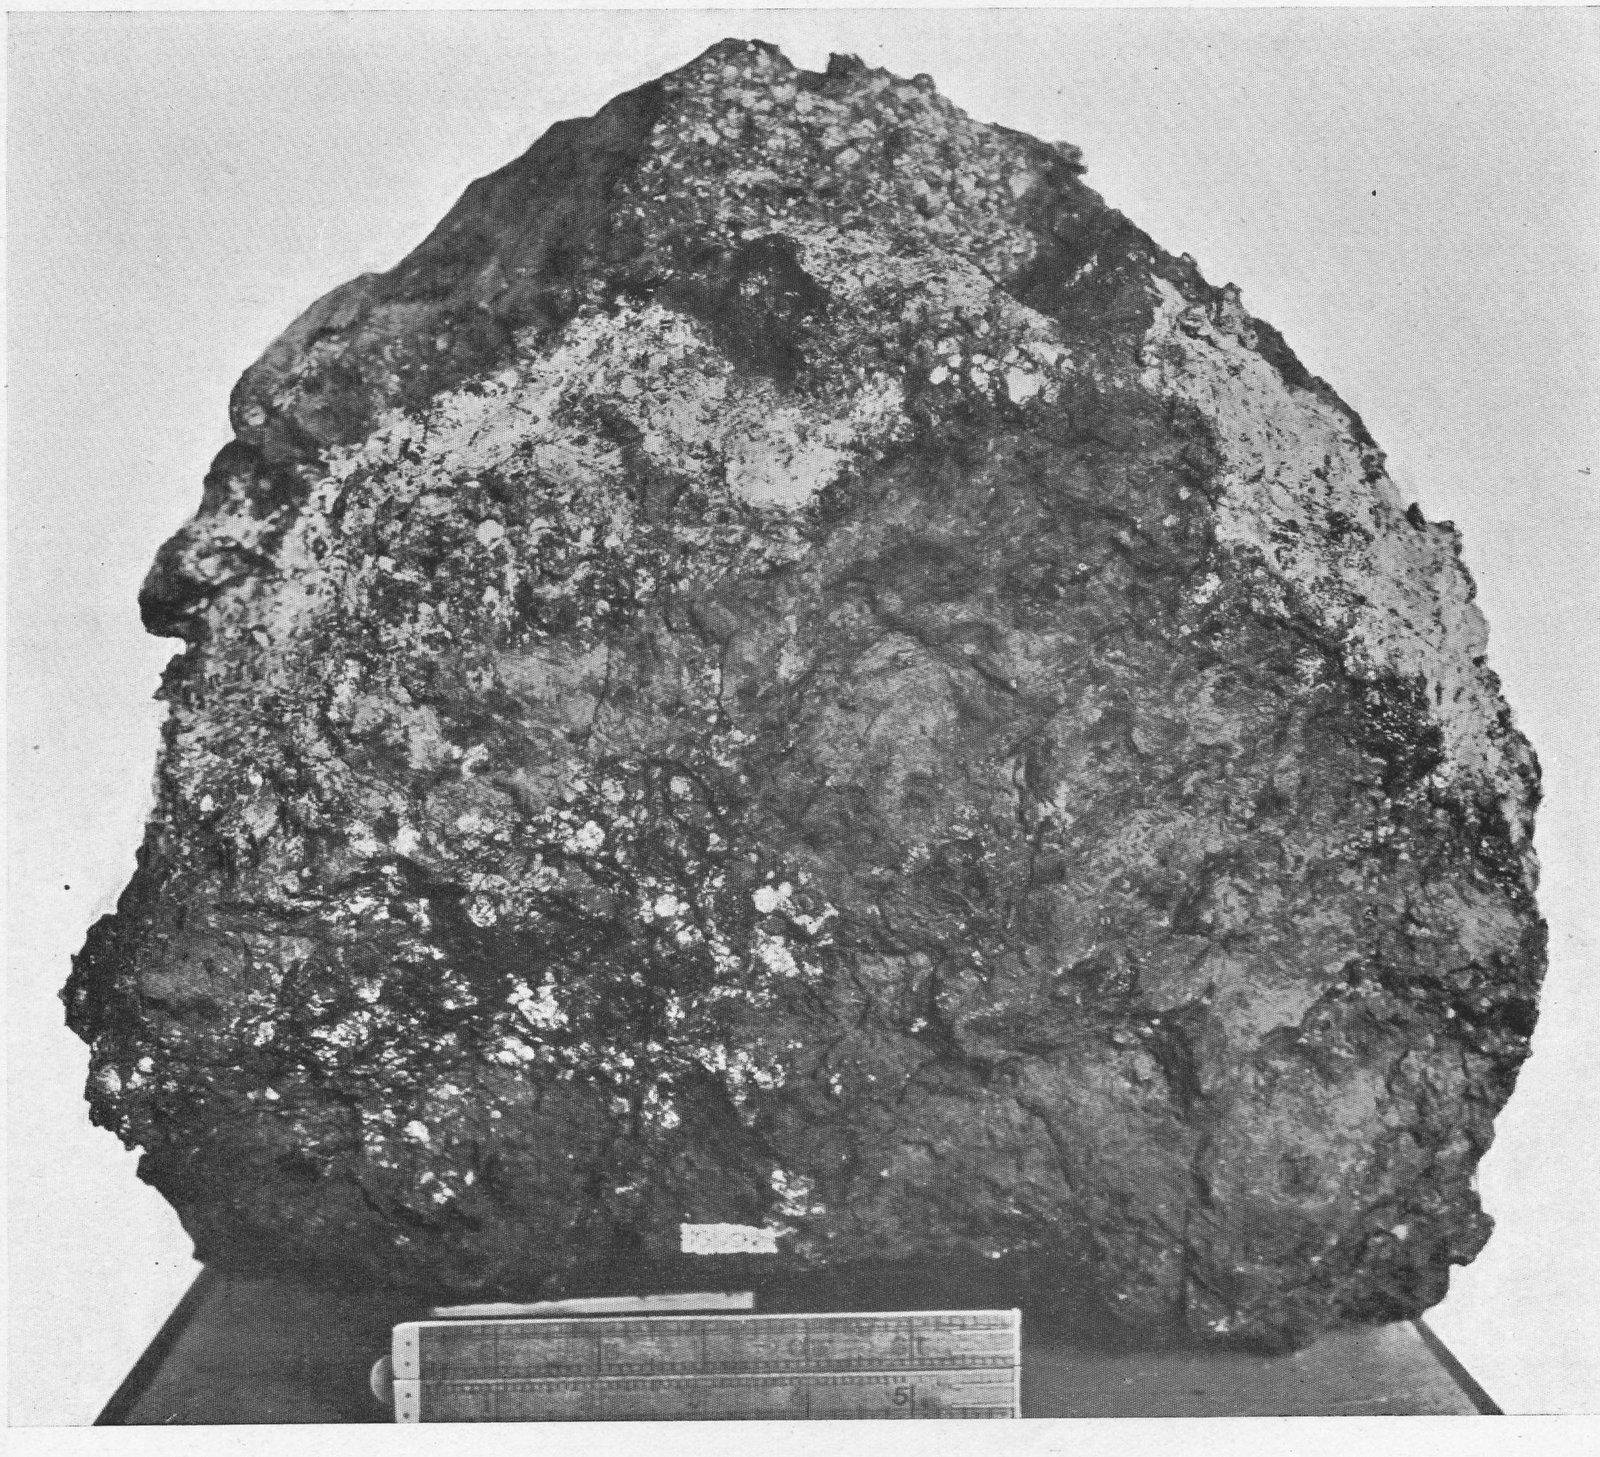 The Molong Meteorite